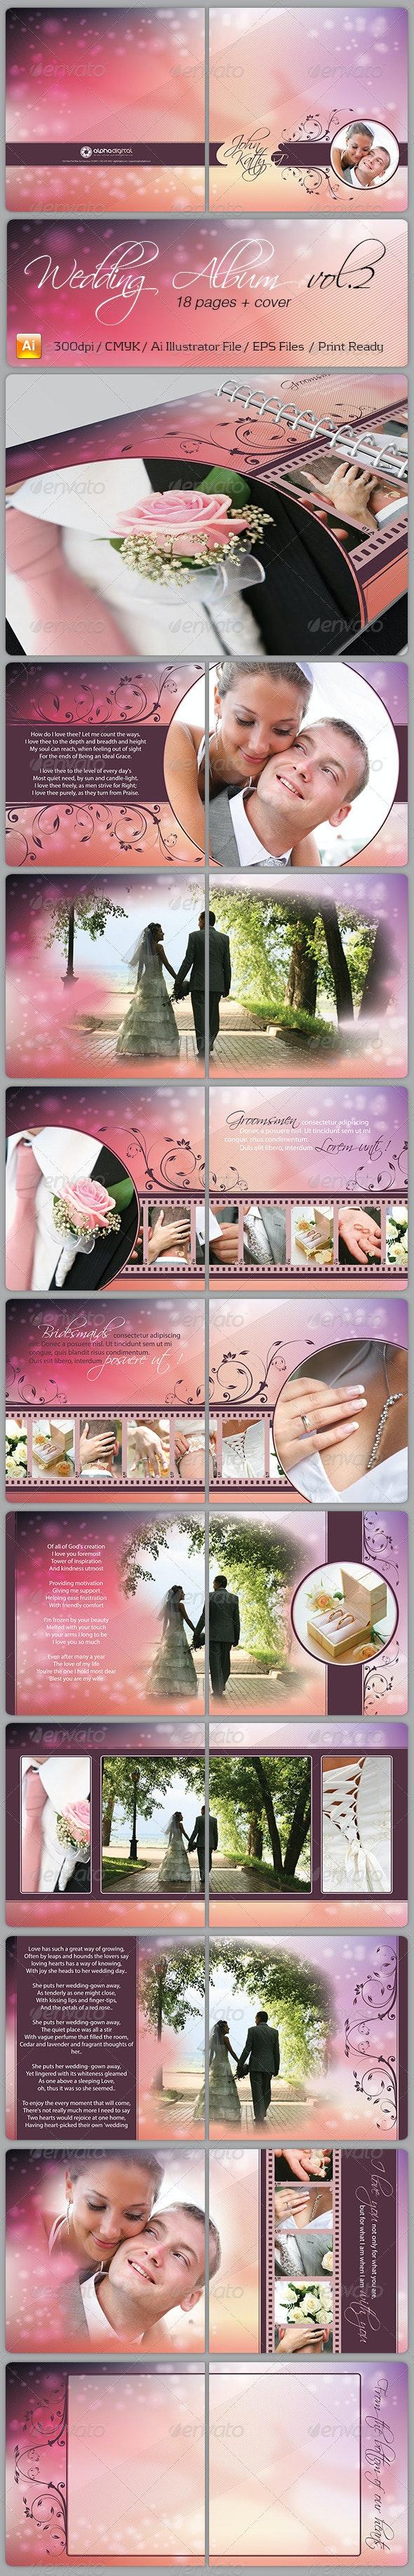 Wedding Album Vol.2 - Photo Albums Print Templates